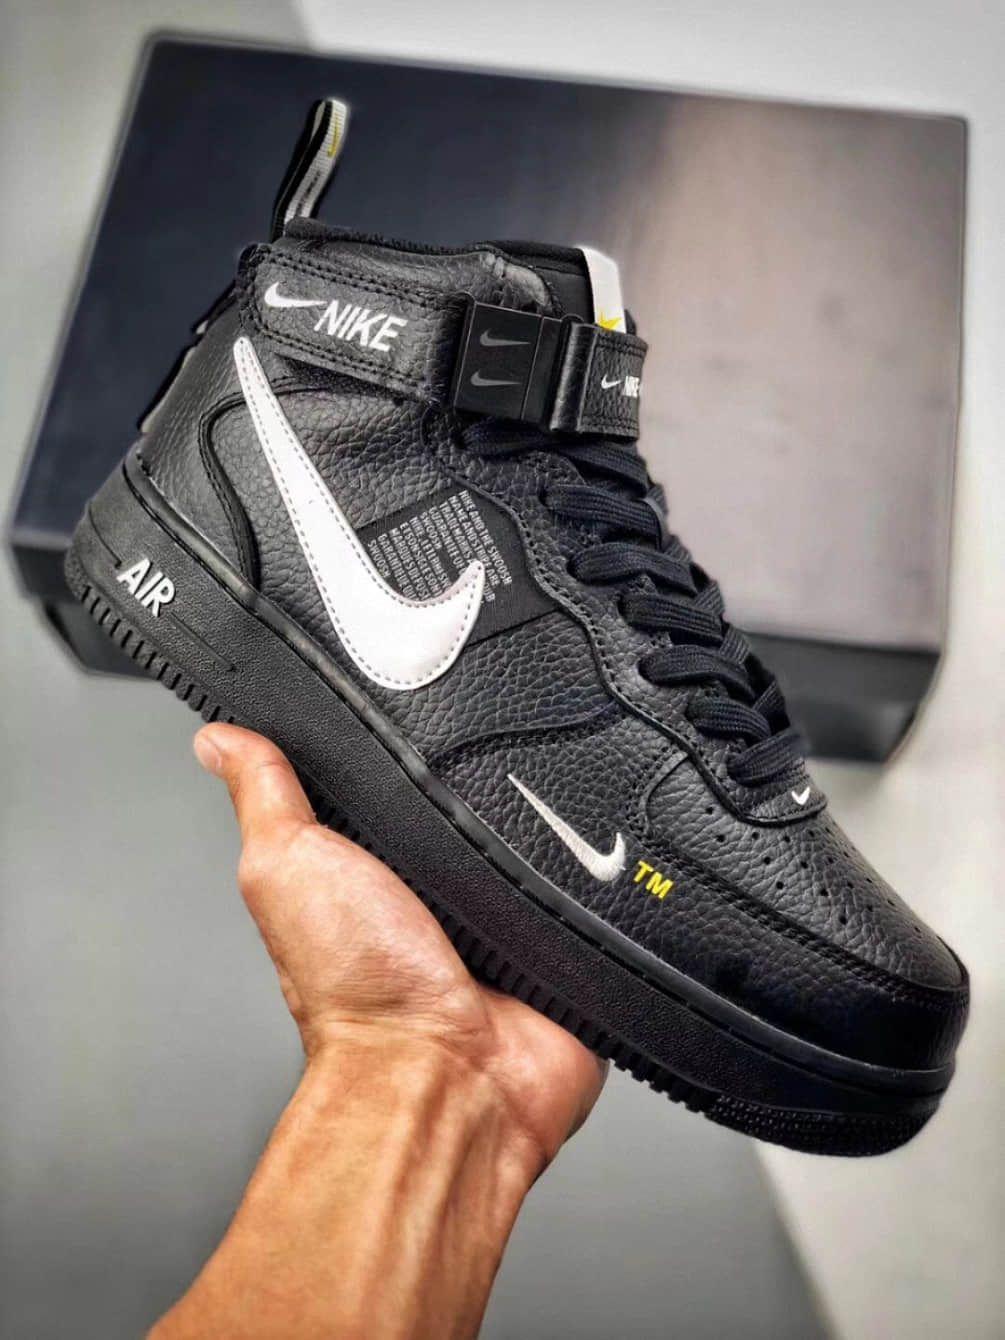 Nike Air Force 1 '07 Mid LV8 Utility